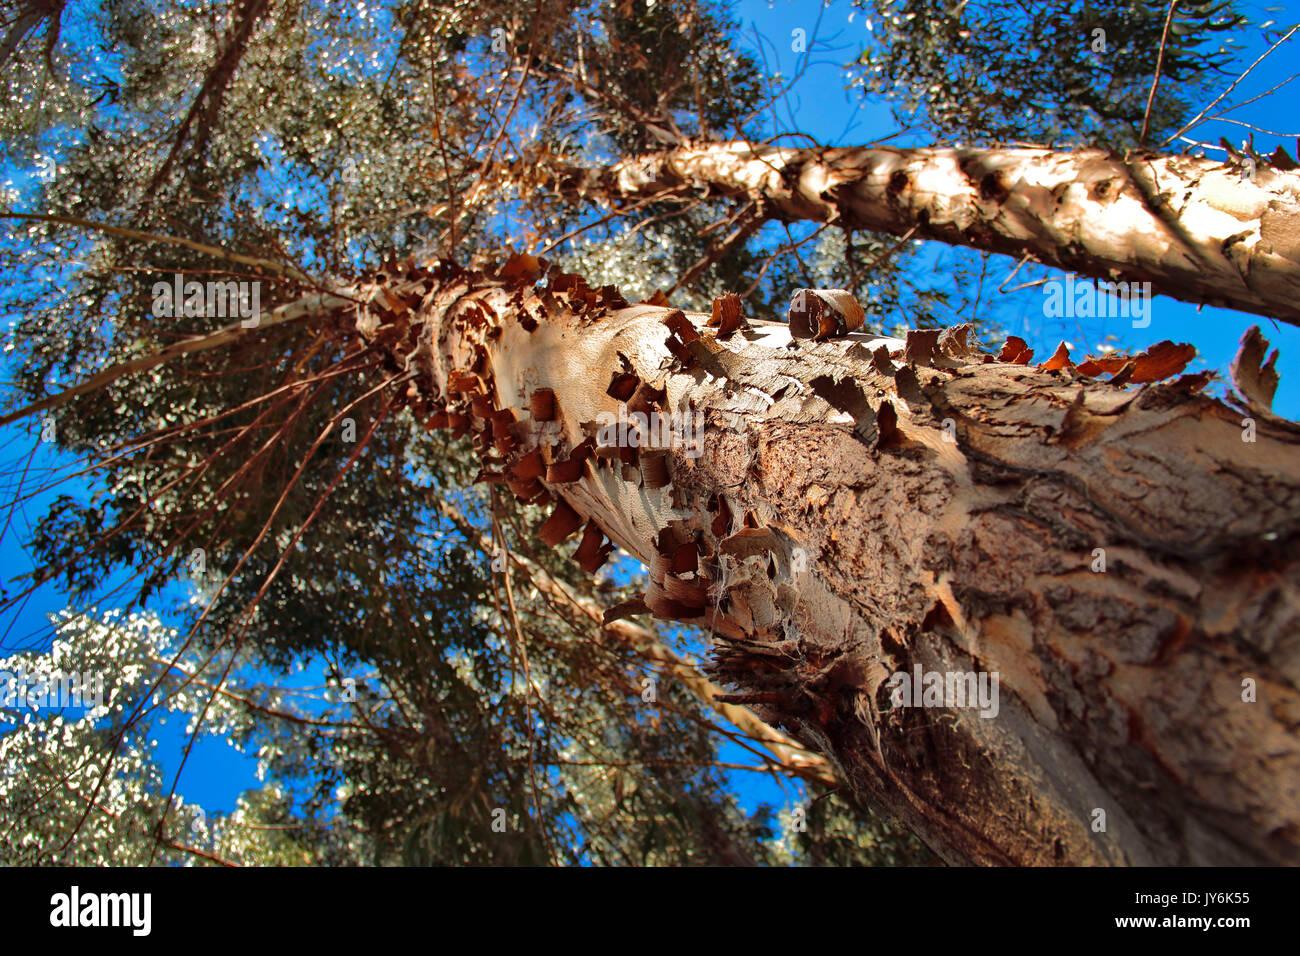 El eucalipto blanco, eucalipto común o eucalipto azul. Eucalyptus globulus es una especie arbórea de la familia de las mirtáceas, originaria del sures - Stock Image